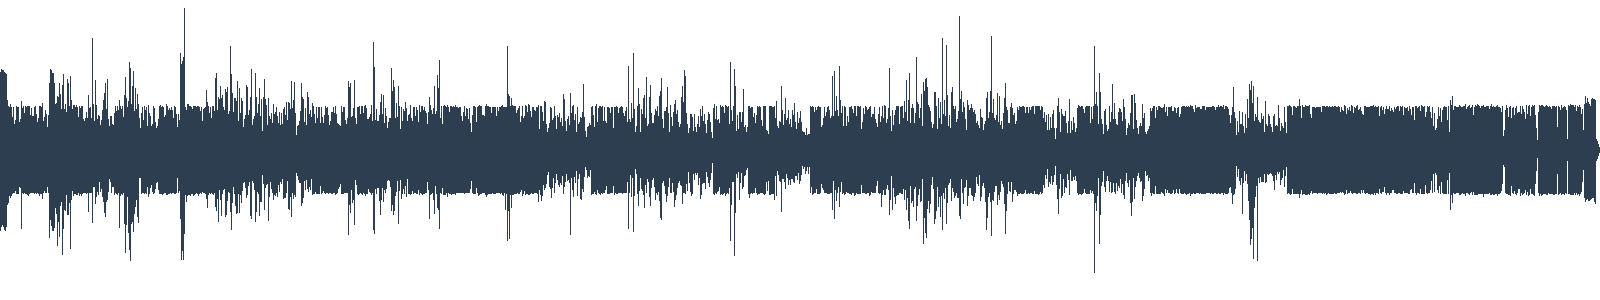 #60 Návrat Alejandra, Valkenburg preview a berlínske dozvuky waveform